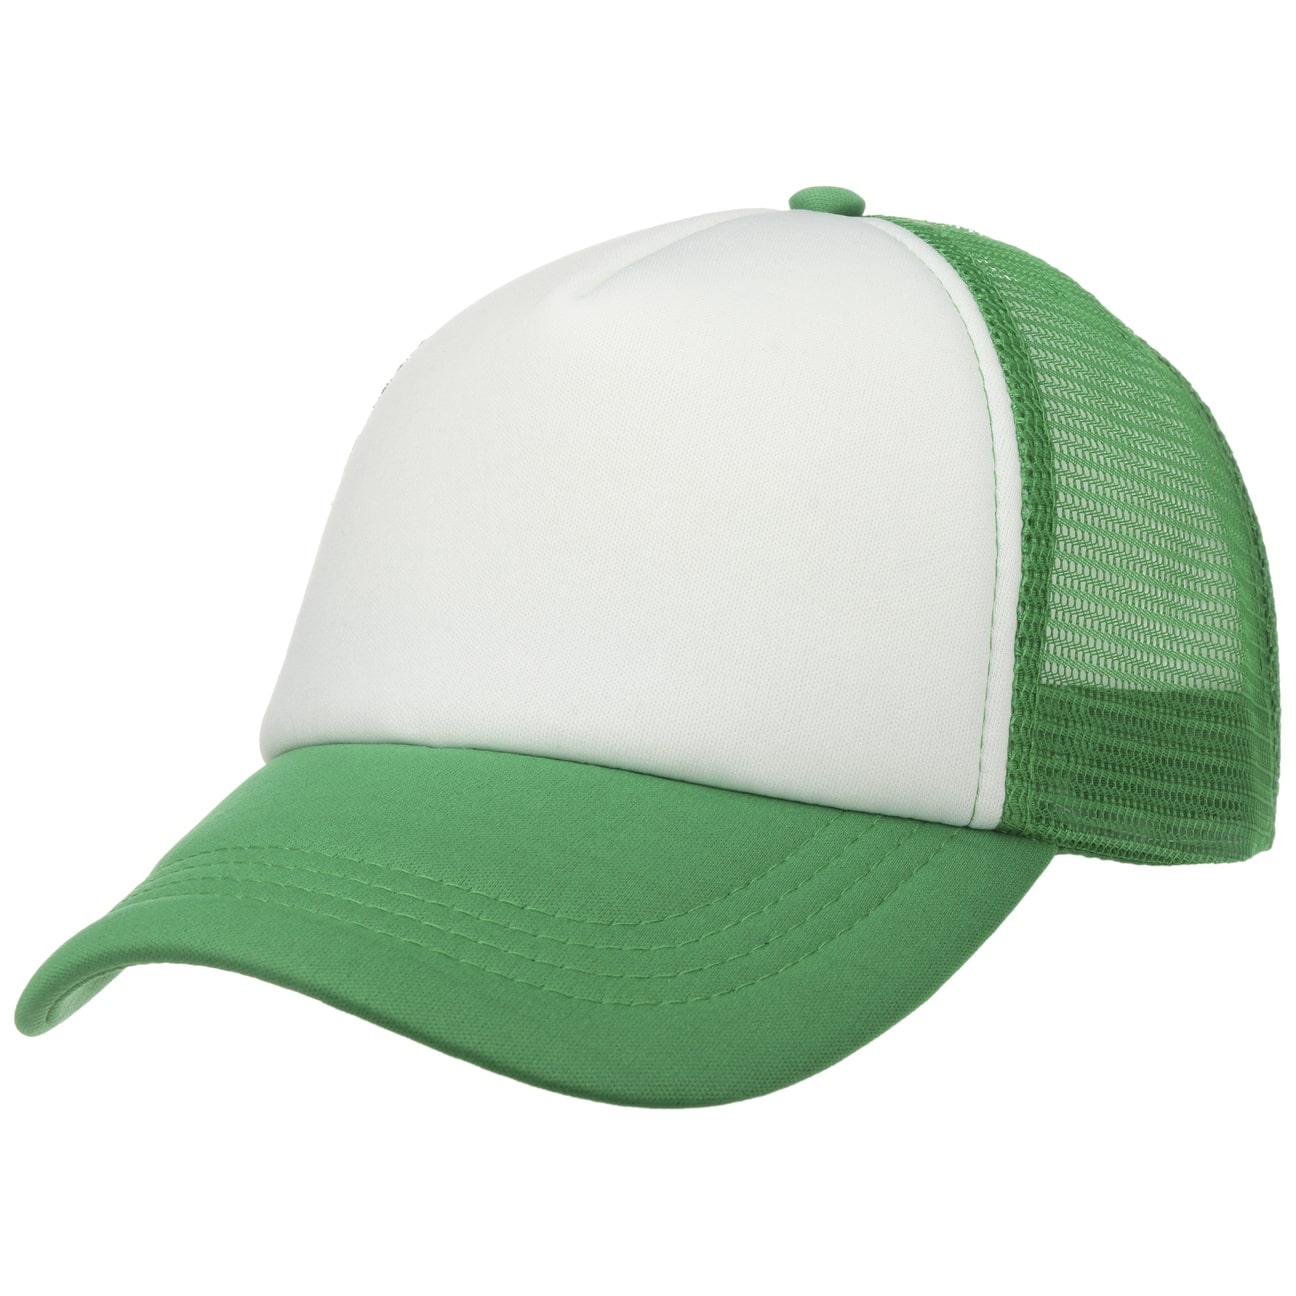 Gorra de Malla 70er Rapper - Gorras - sombreroshop.es 5533a0752b9